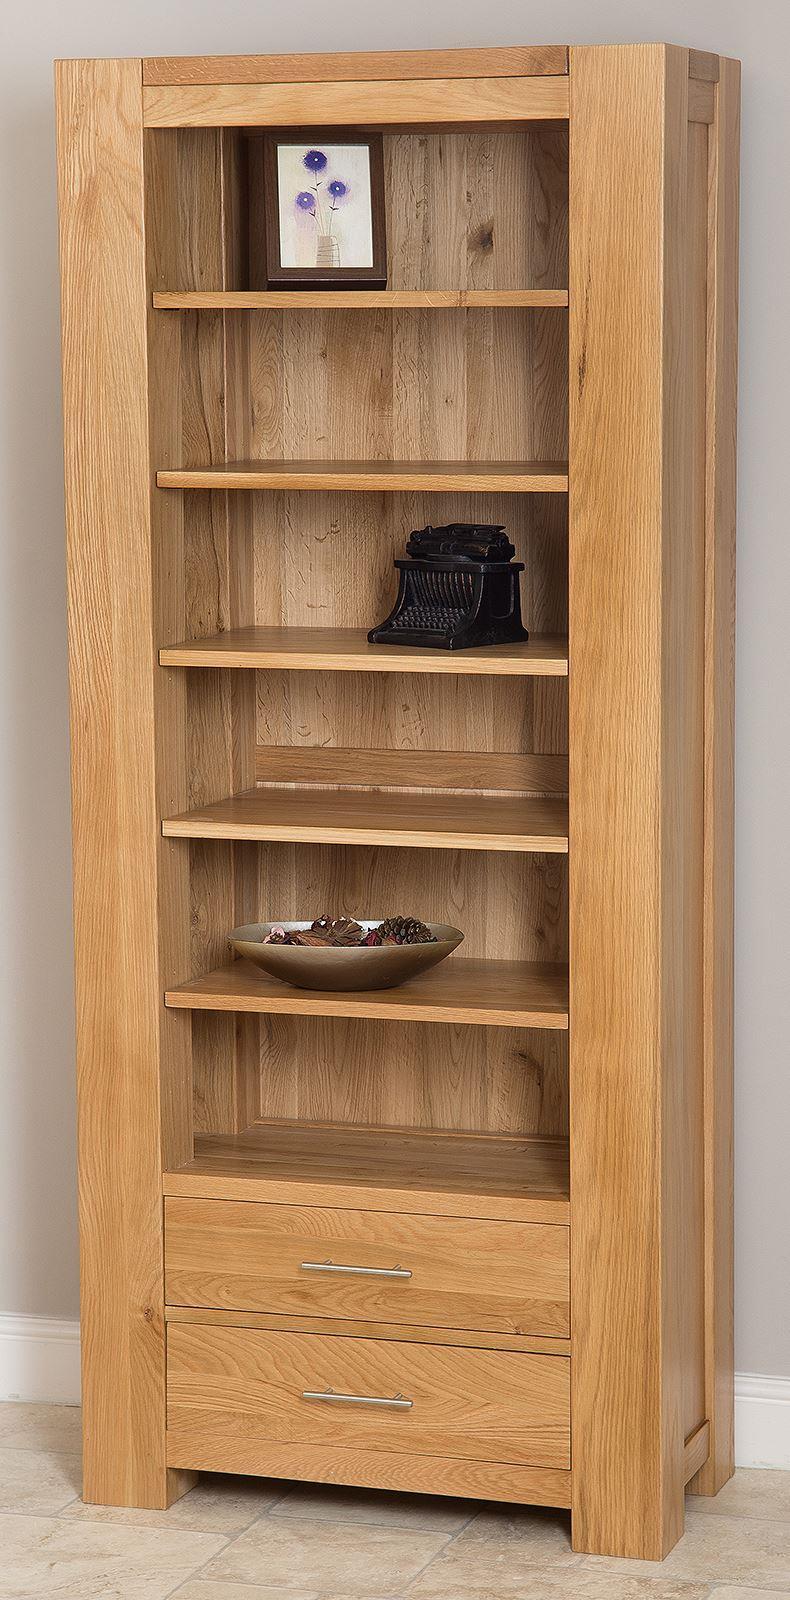 Kuba Solid Oak 2 Drawer Large Bookcase